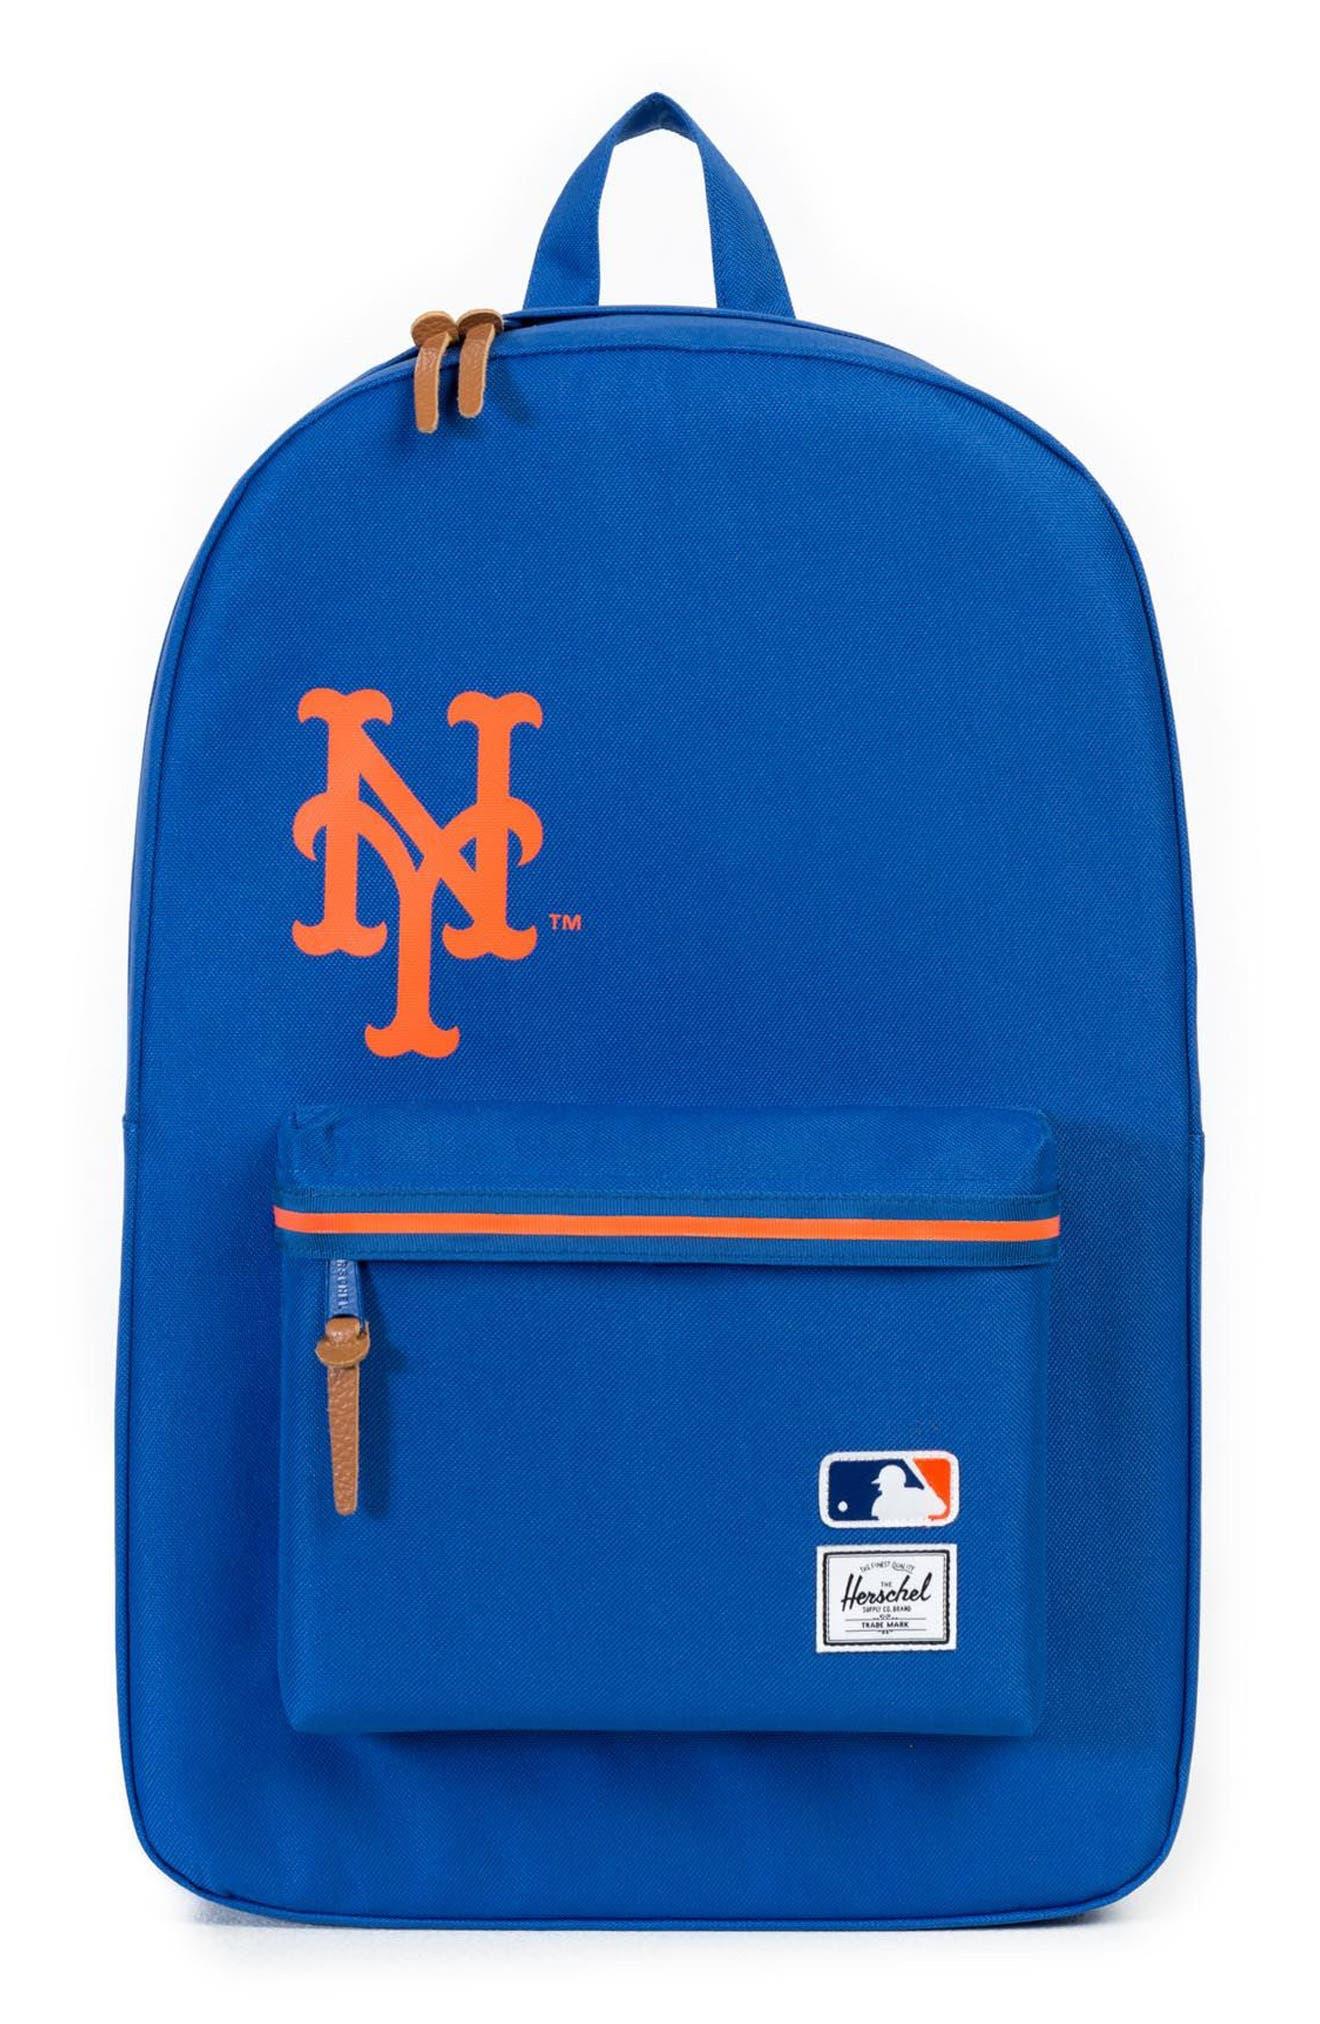 Herschel Supply Co. Heritage - Mlb National League Backpack - Blue